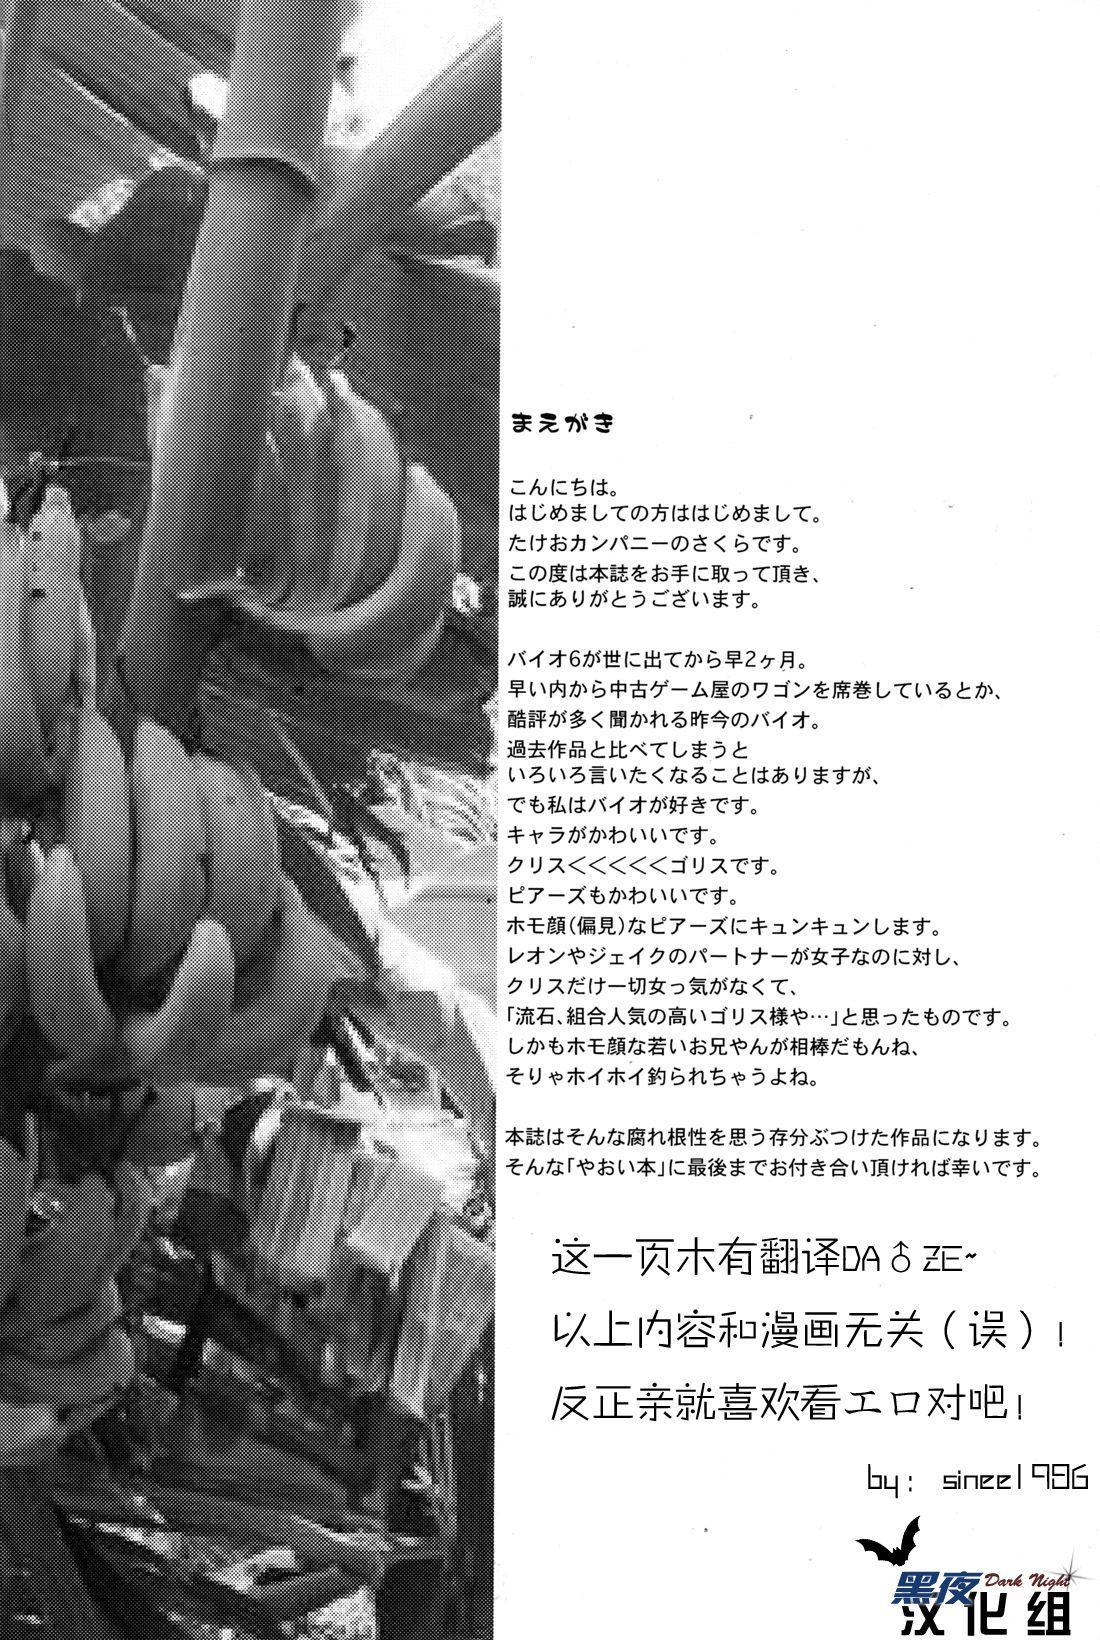 Kenbou Gorilla wa Banana no Yume o Miruka? | 健忘的大猩猩会梦见香蕉吗? 11